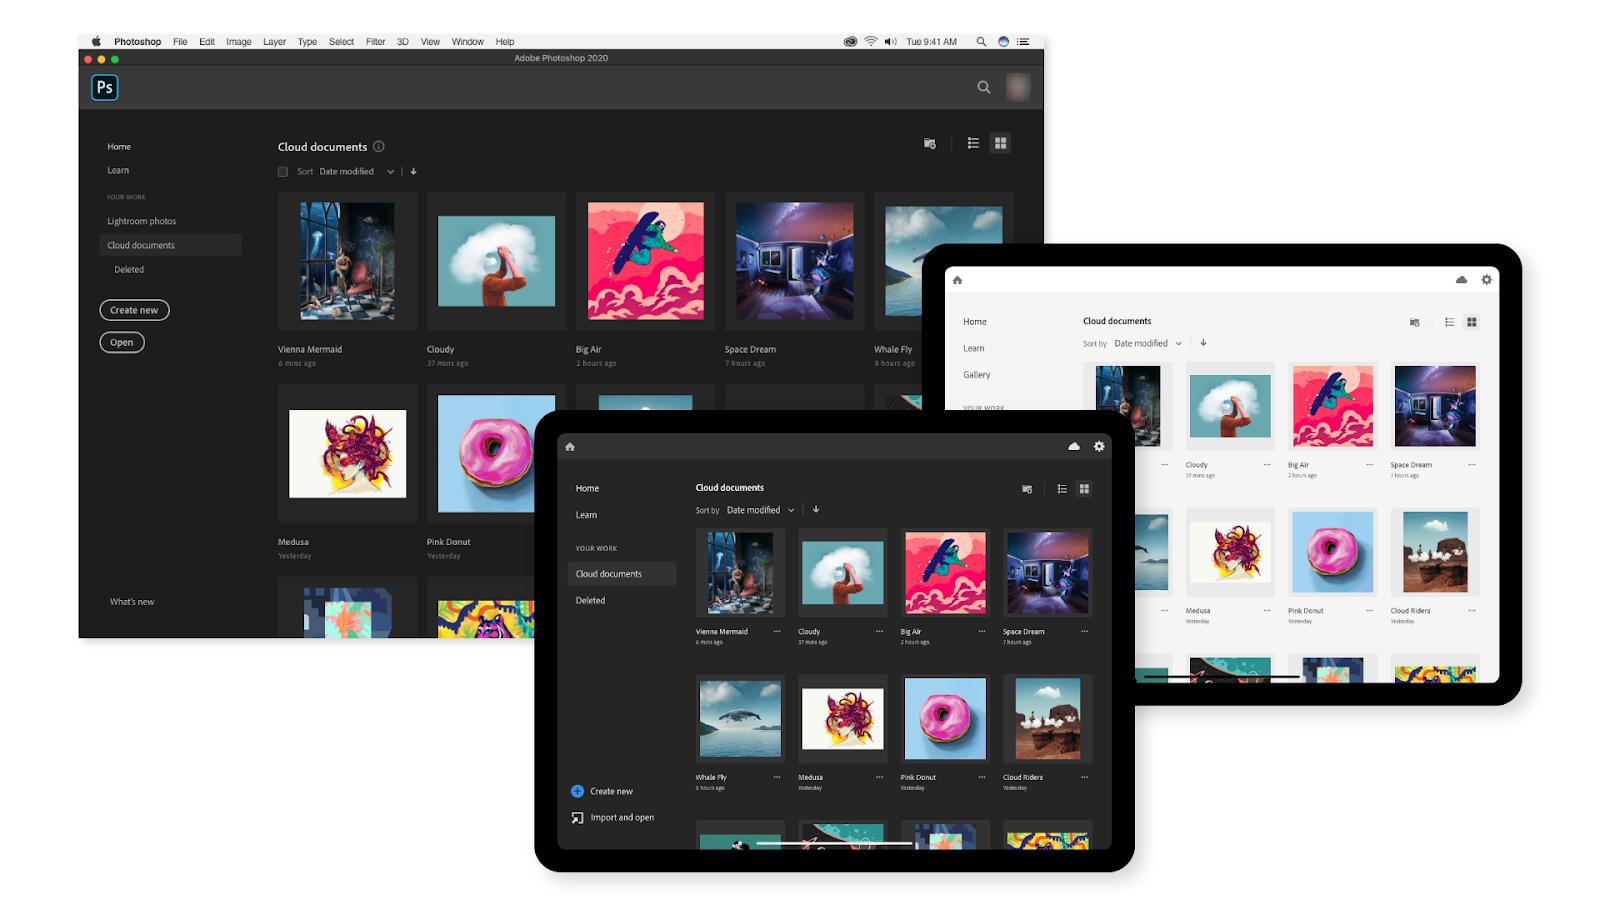 PS 2020中文一键安装版本 Adobe Photoshop 2020 SP 电脑软件-第2张